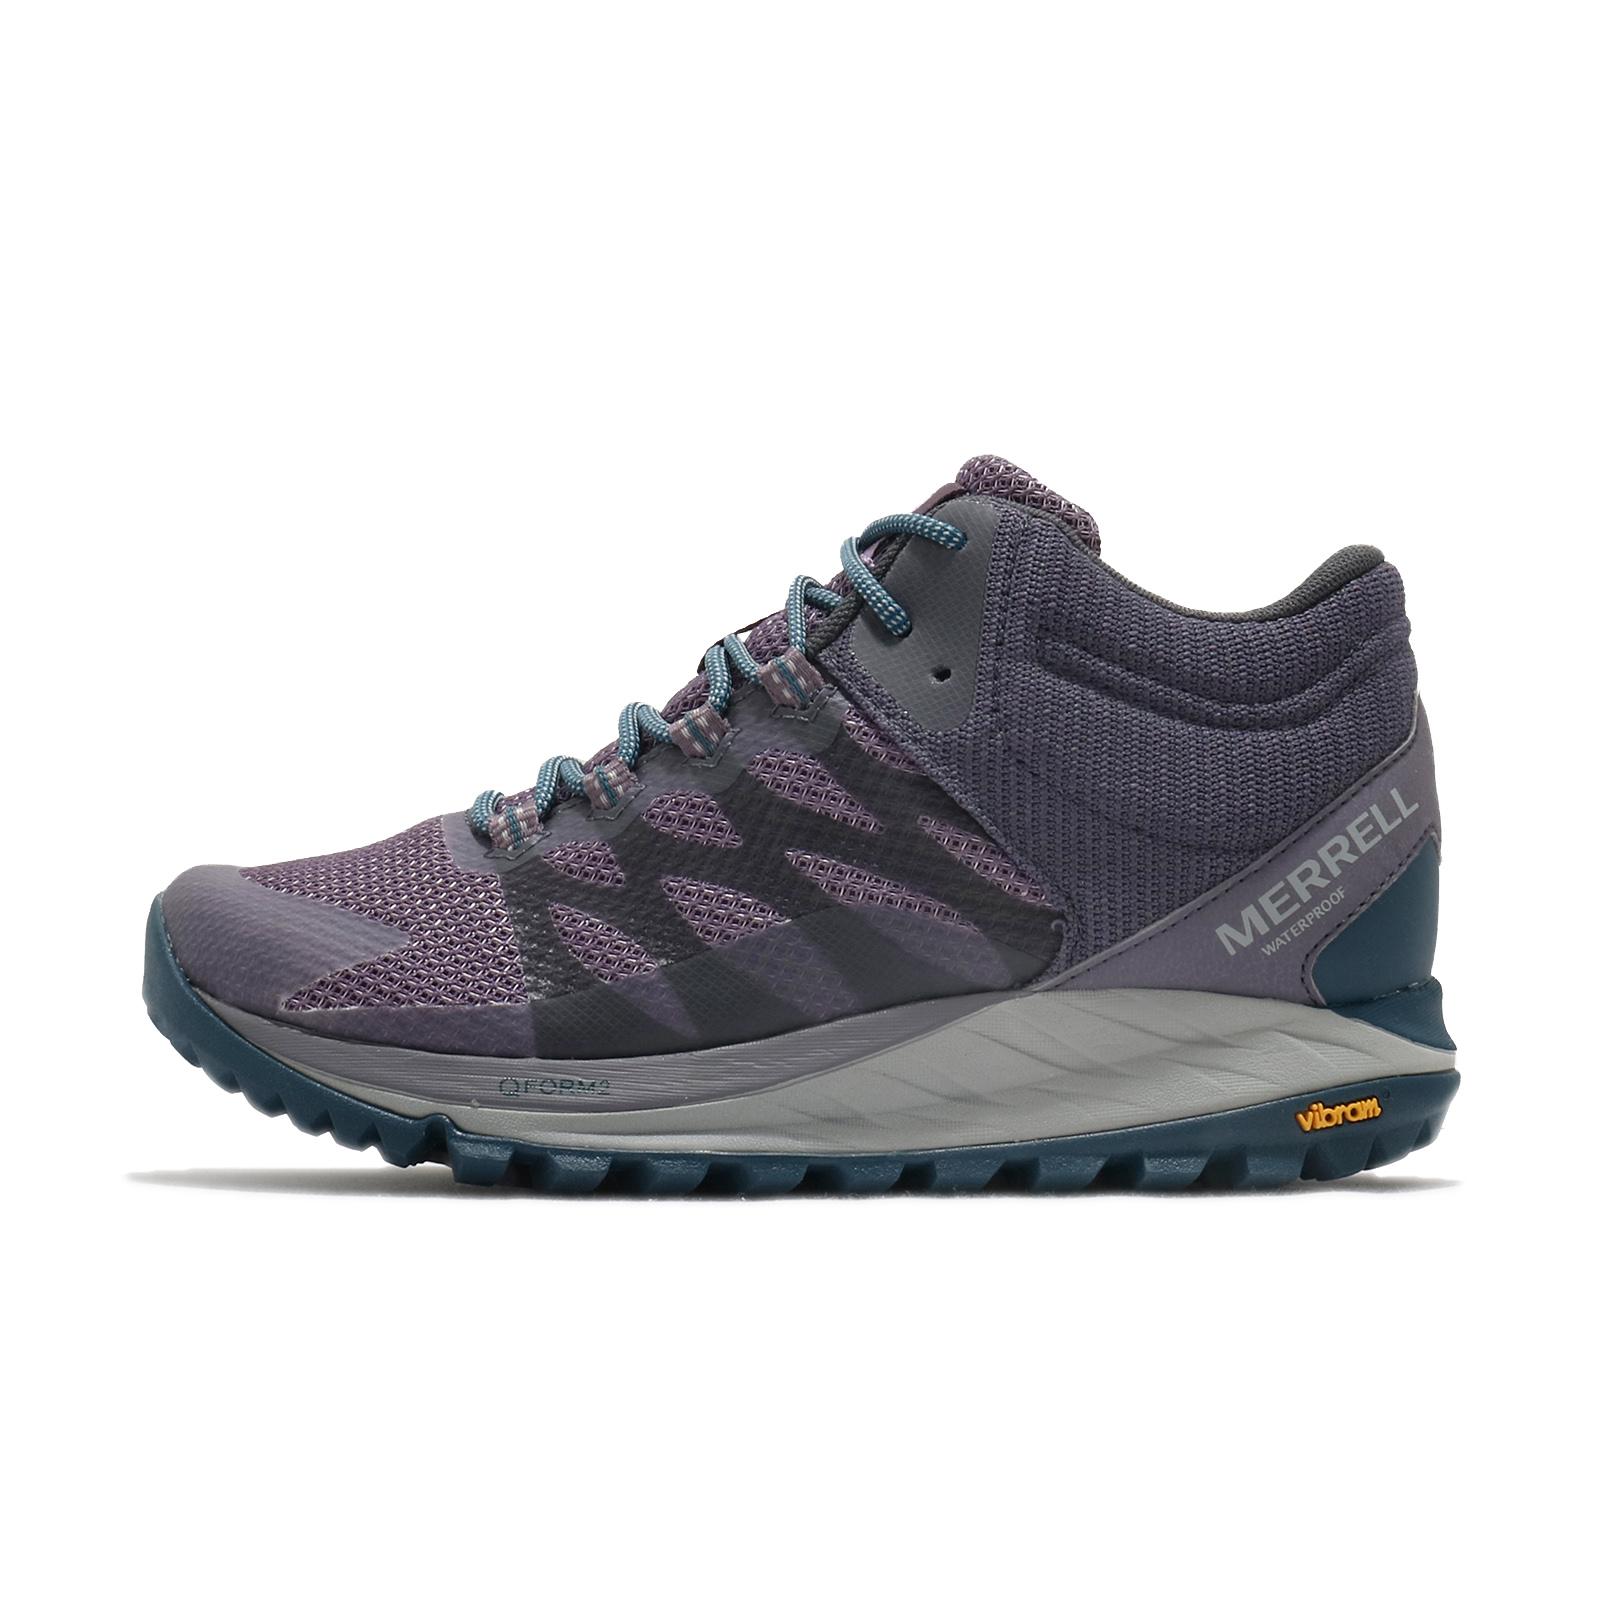 Merrell 戶外鞋 Antora 2 Mid Waterproof 紫 藍 女鞋 野跑 ML035648 【ACS】